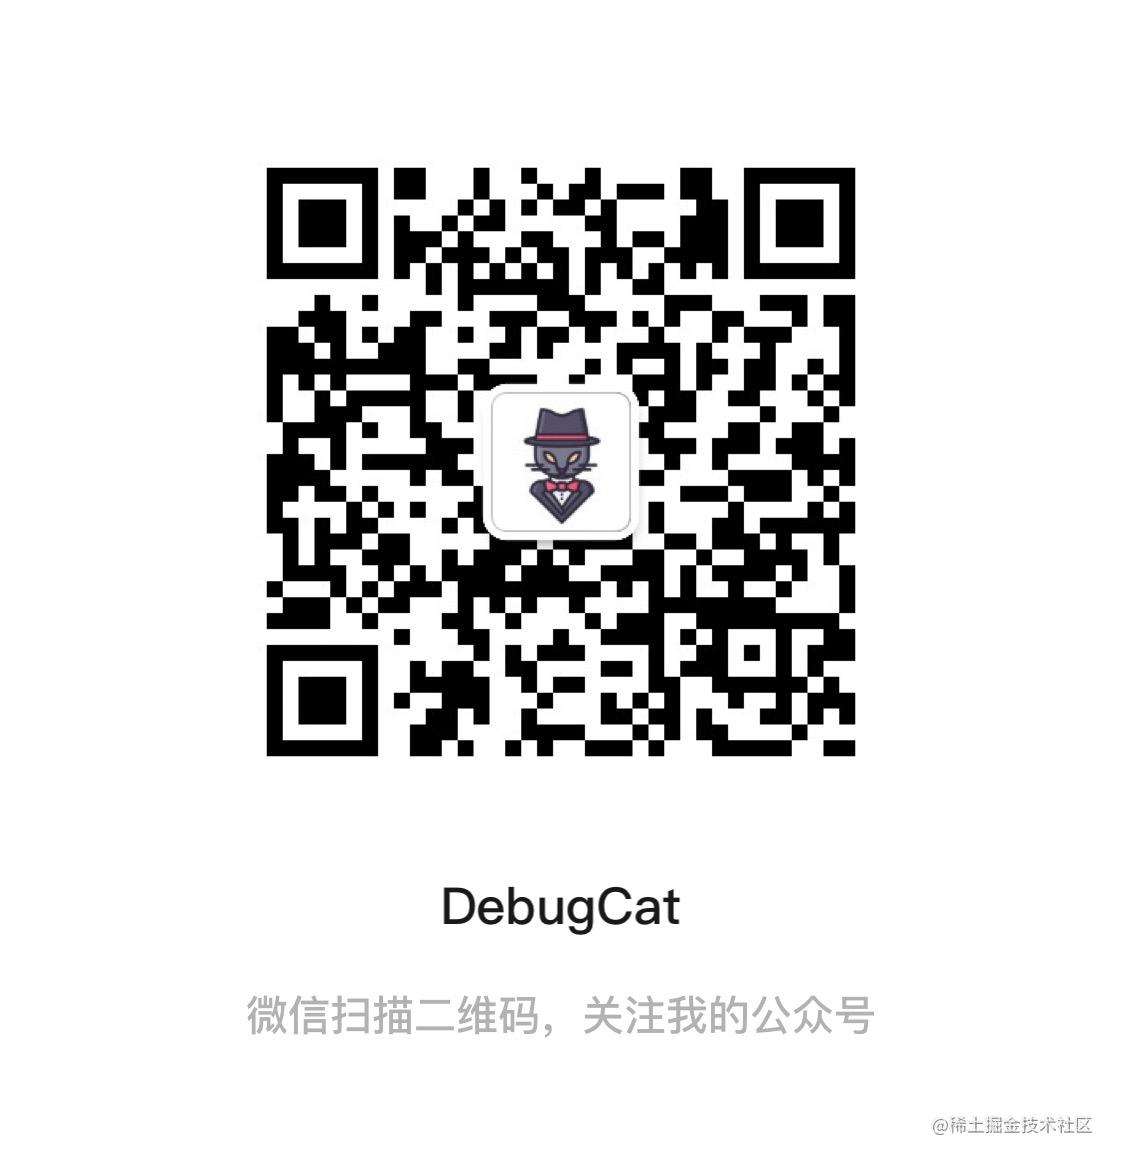 DebugCat